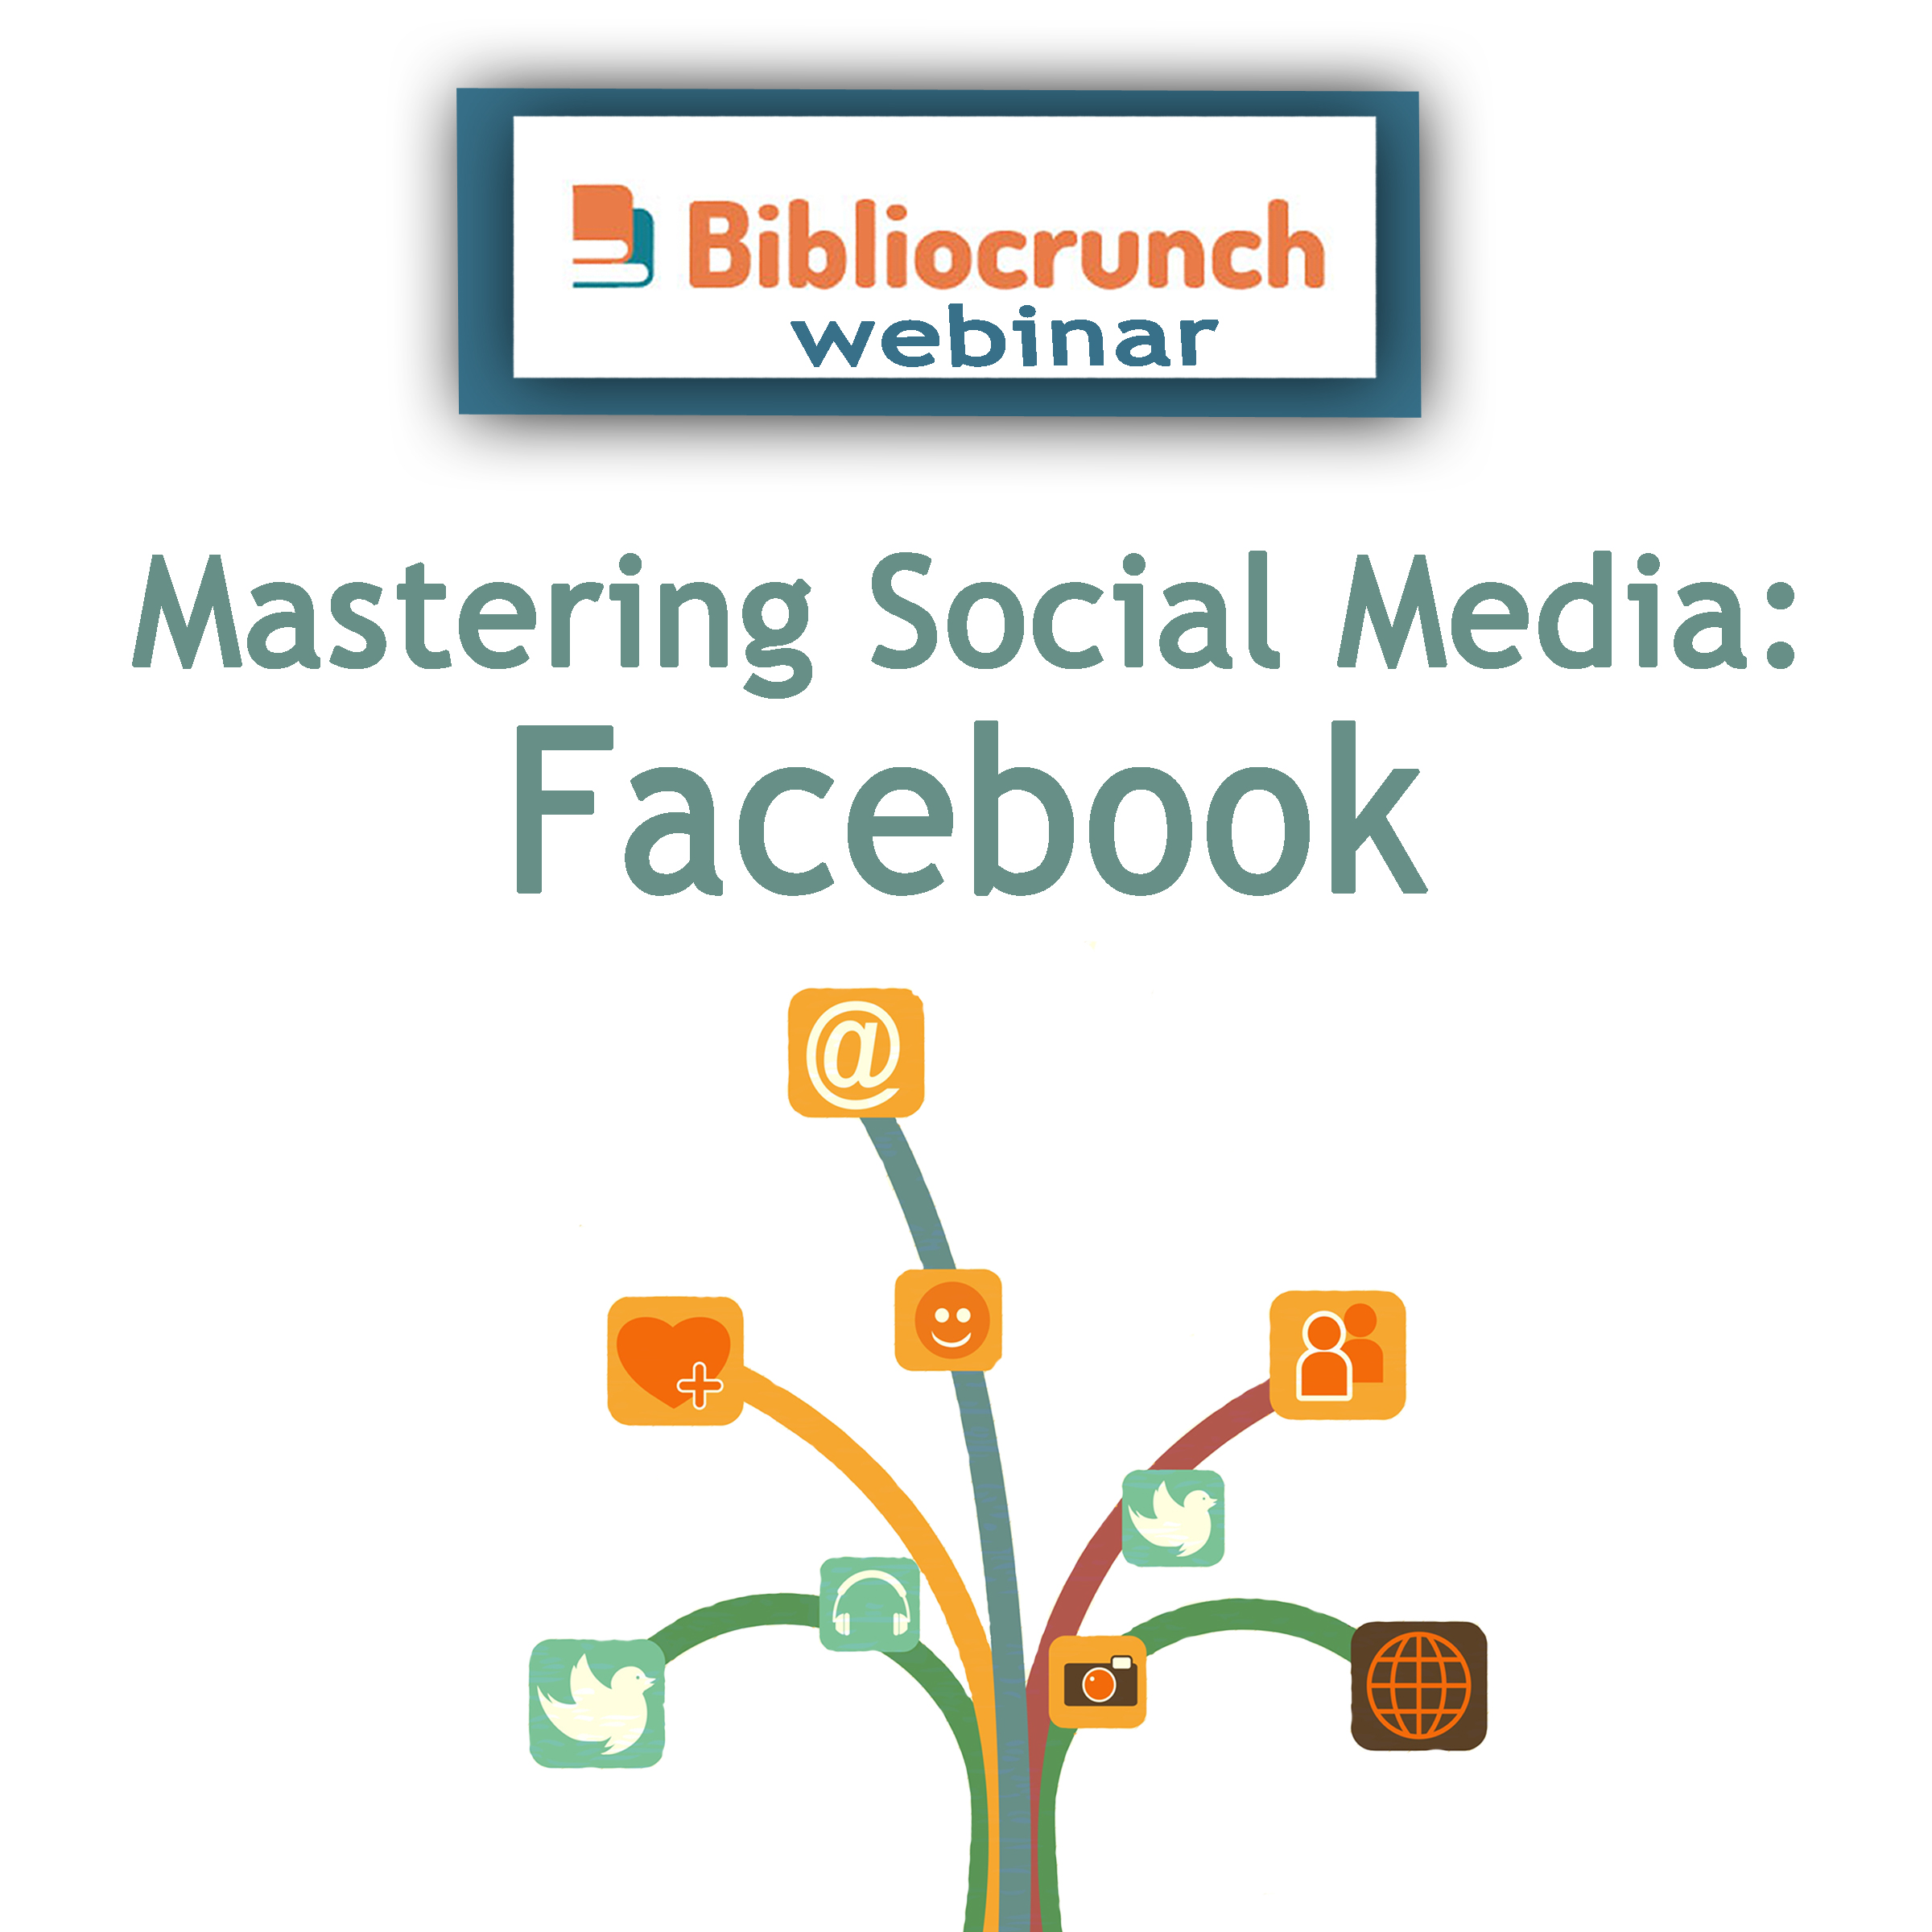 MasterSocialMediaFacebook